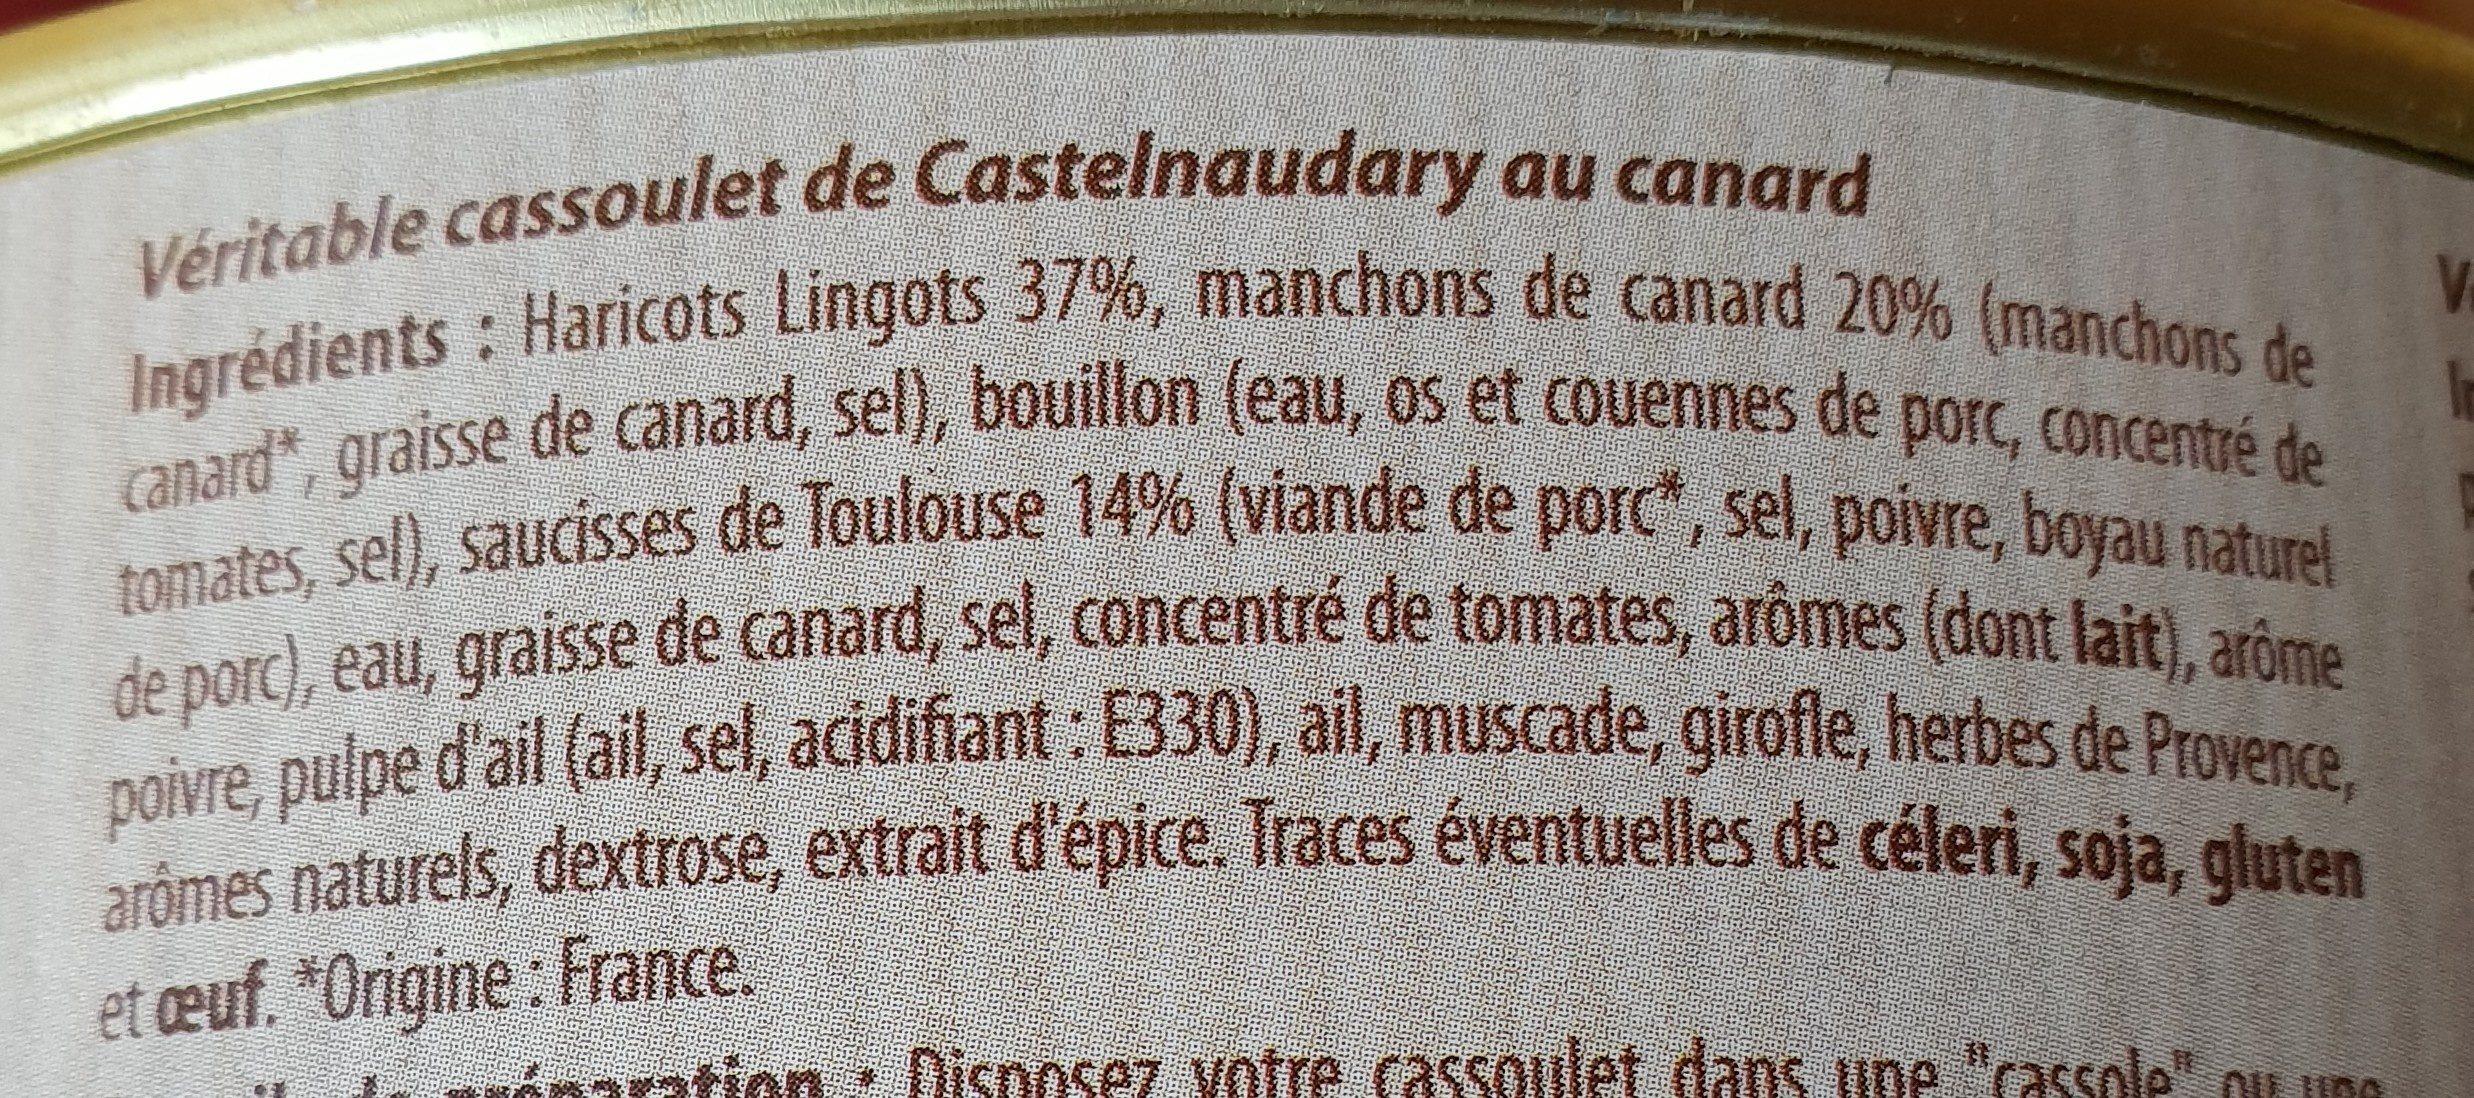 Véritable cassoulet de castelnaudary au canard - Ingrediënten